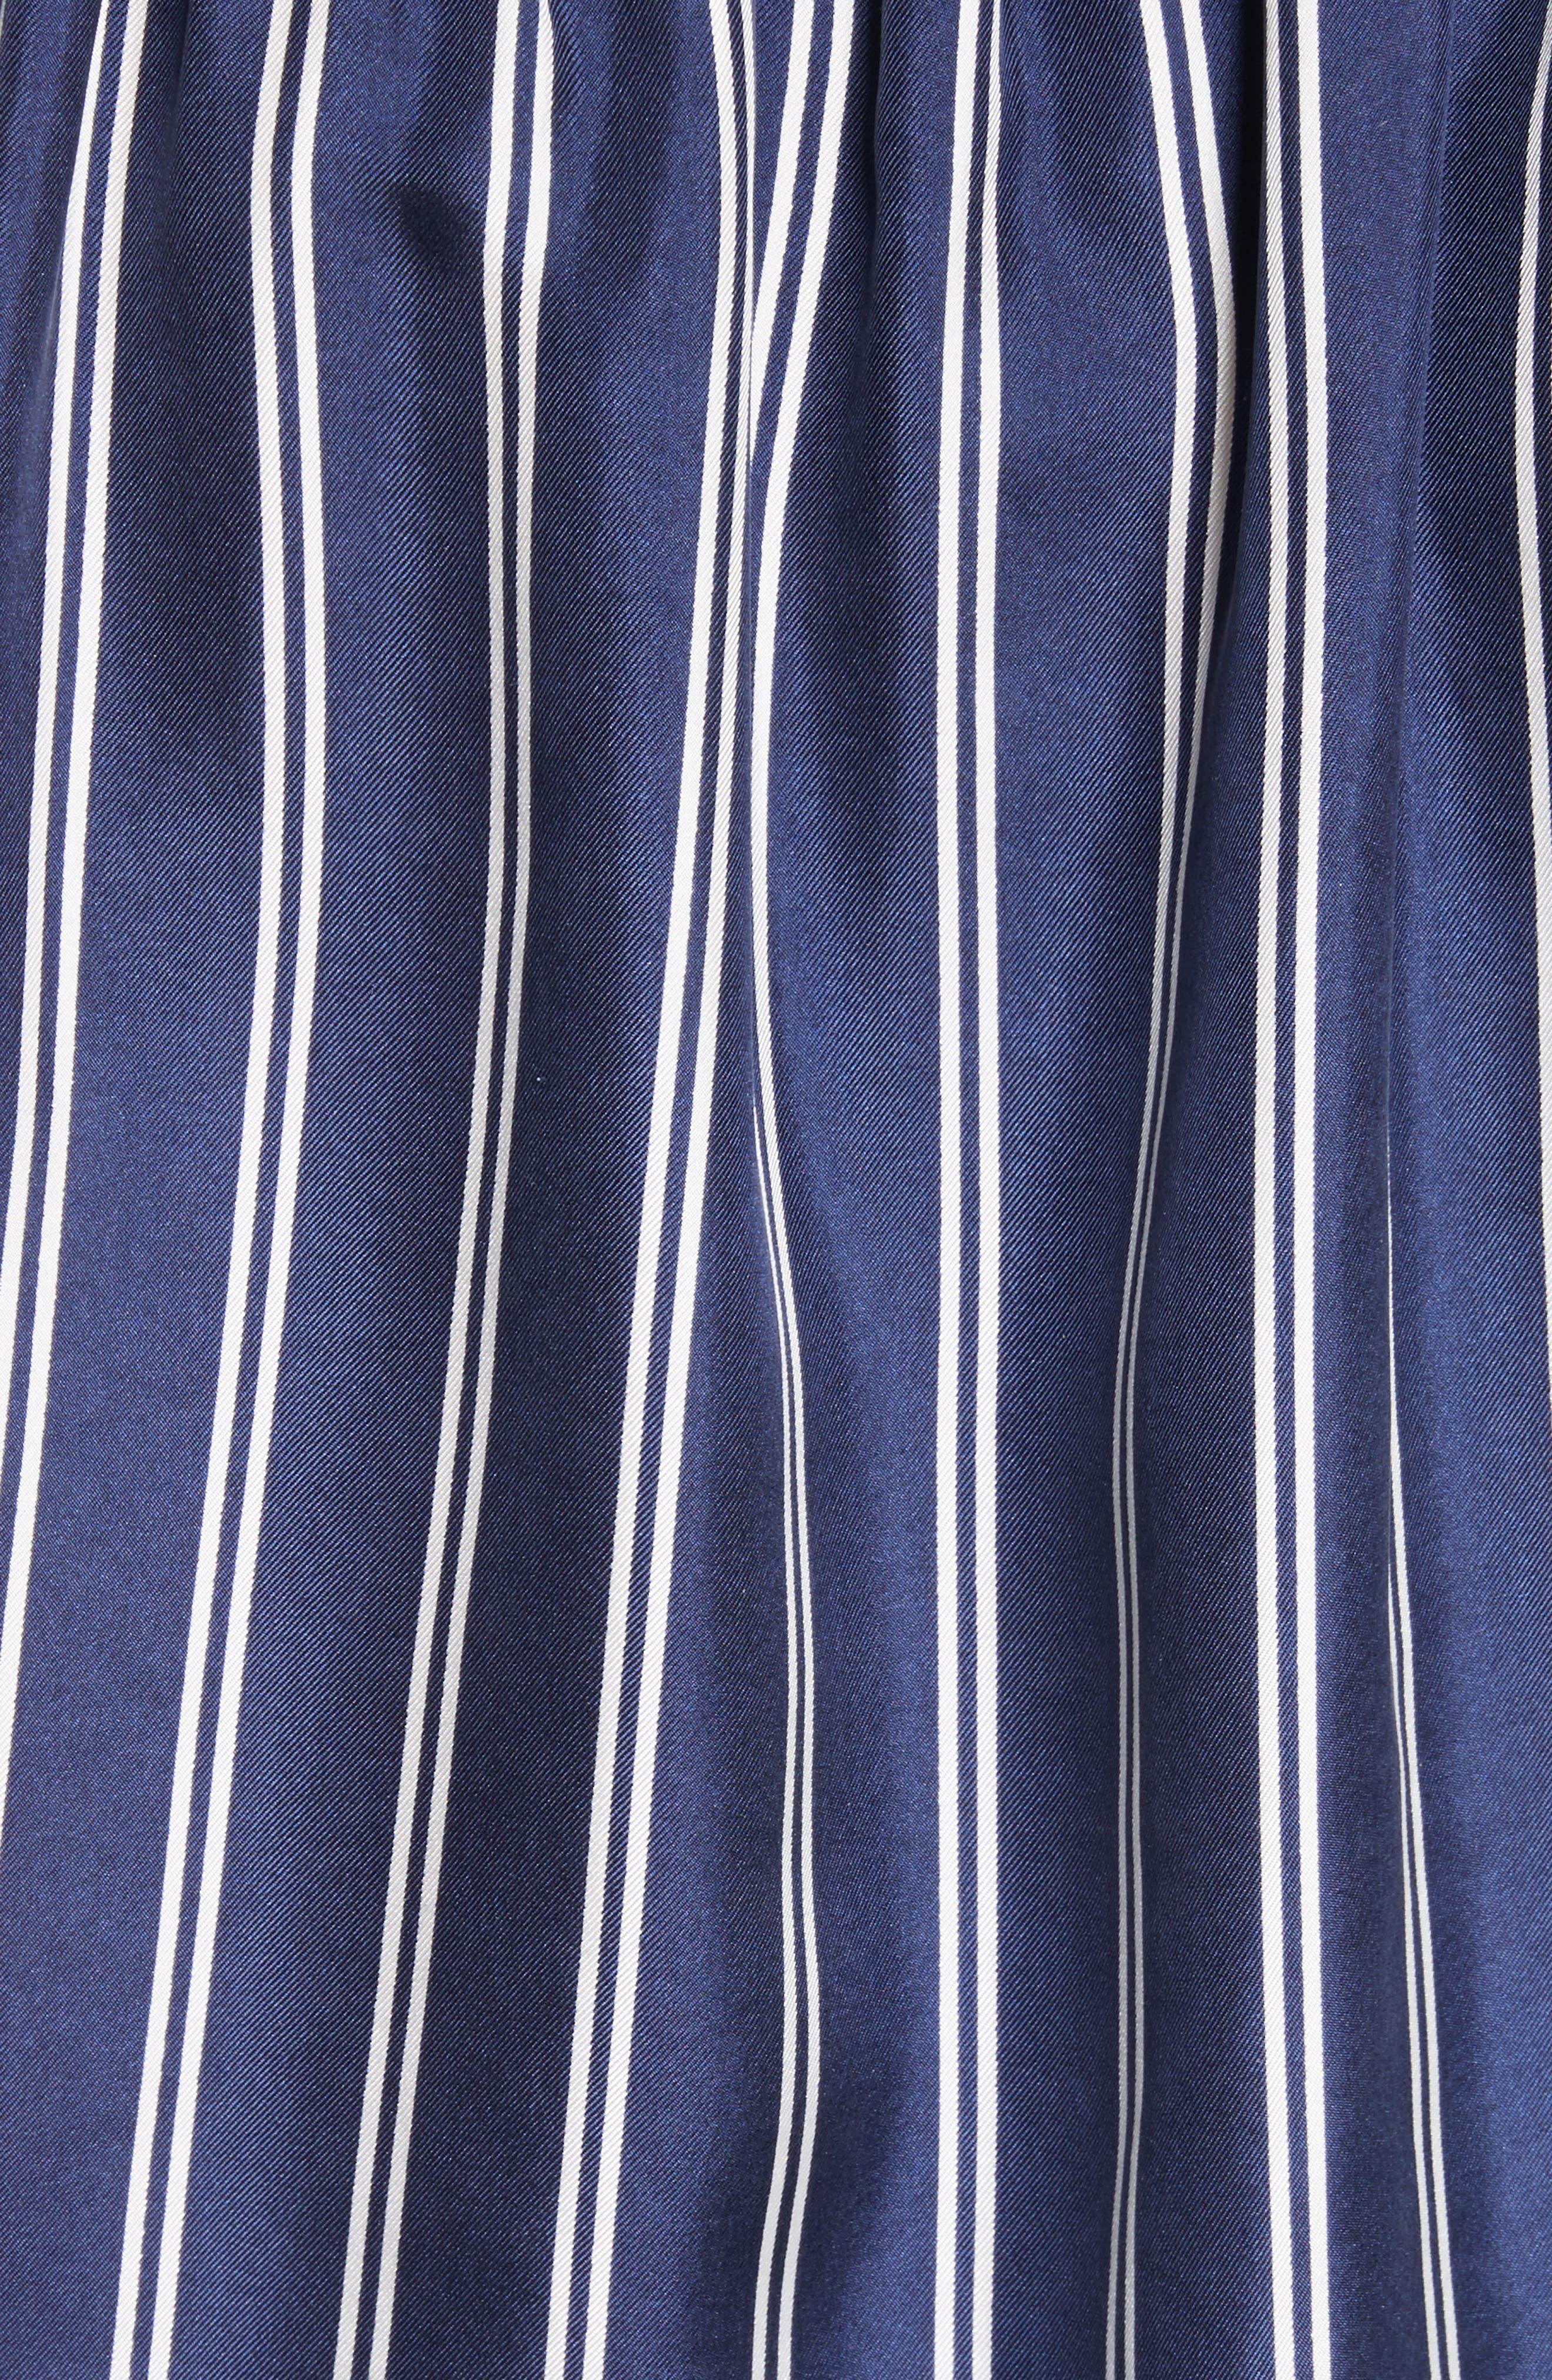 Adiba Stripe Silk Shirt,                             Alternate thumbnail 5, color,                             Dark Navy